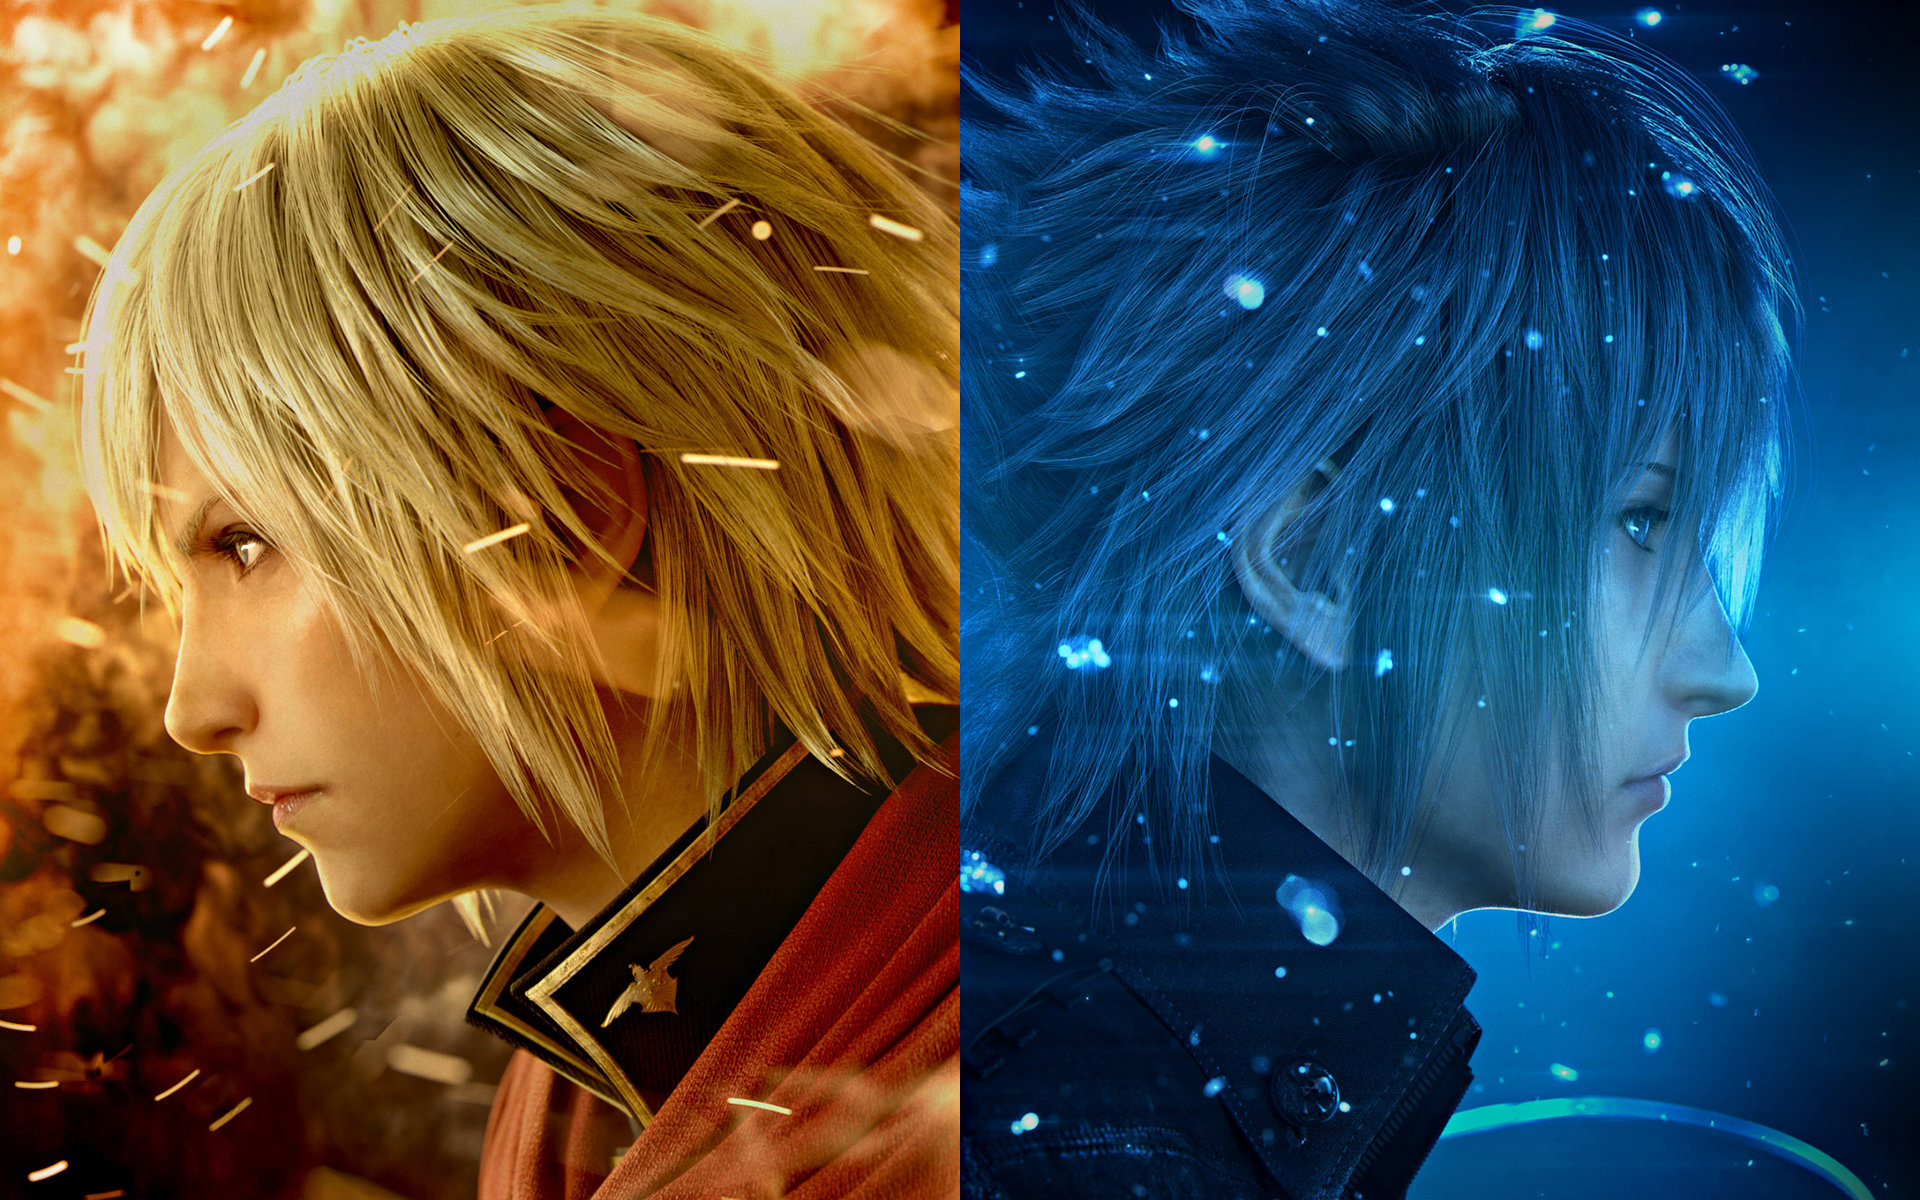 Final Fantasy Type 0 Wallpapers Hd For Desktop Backgrounds